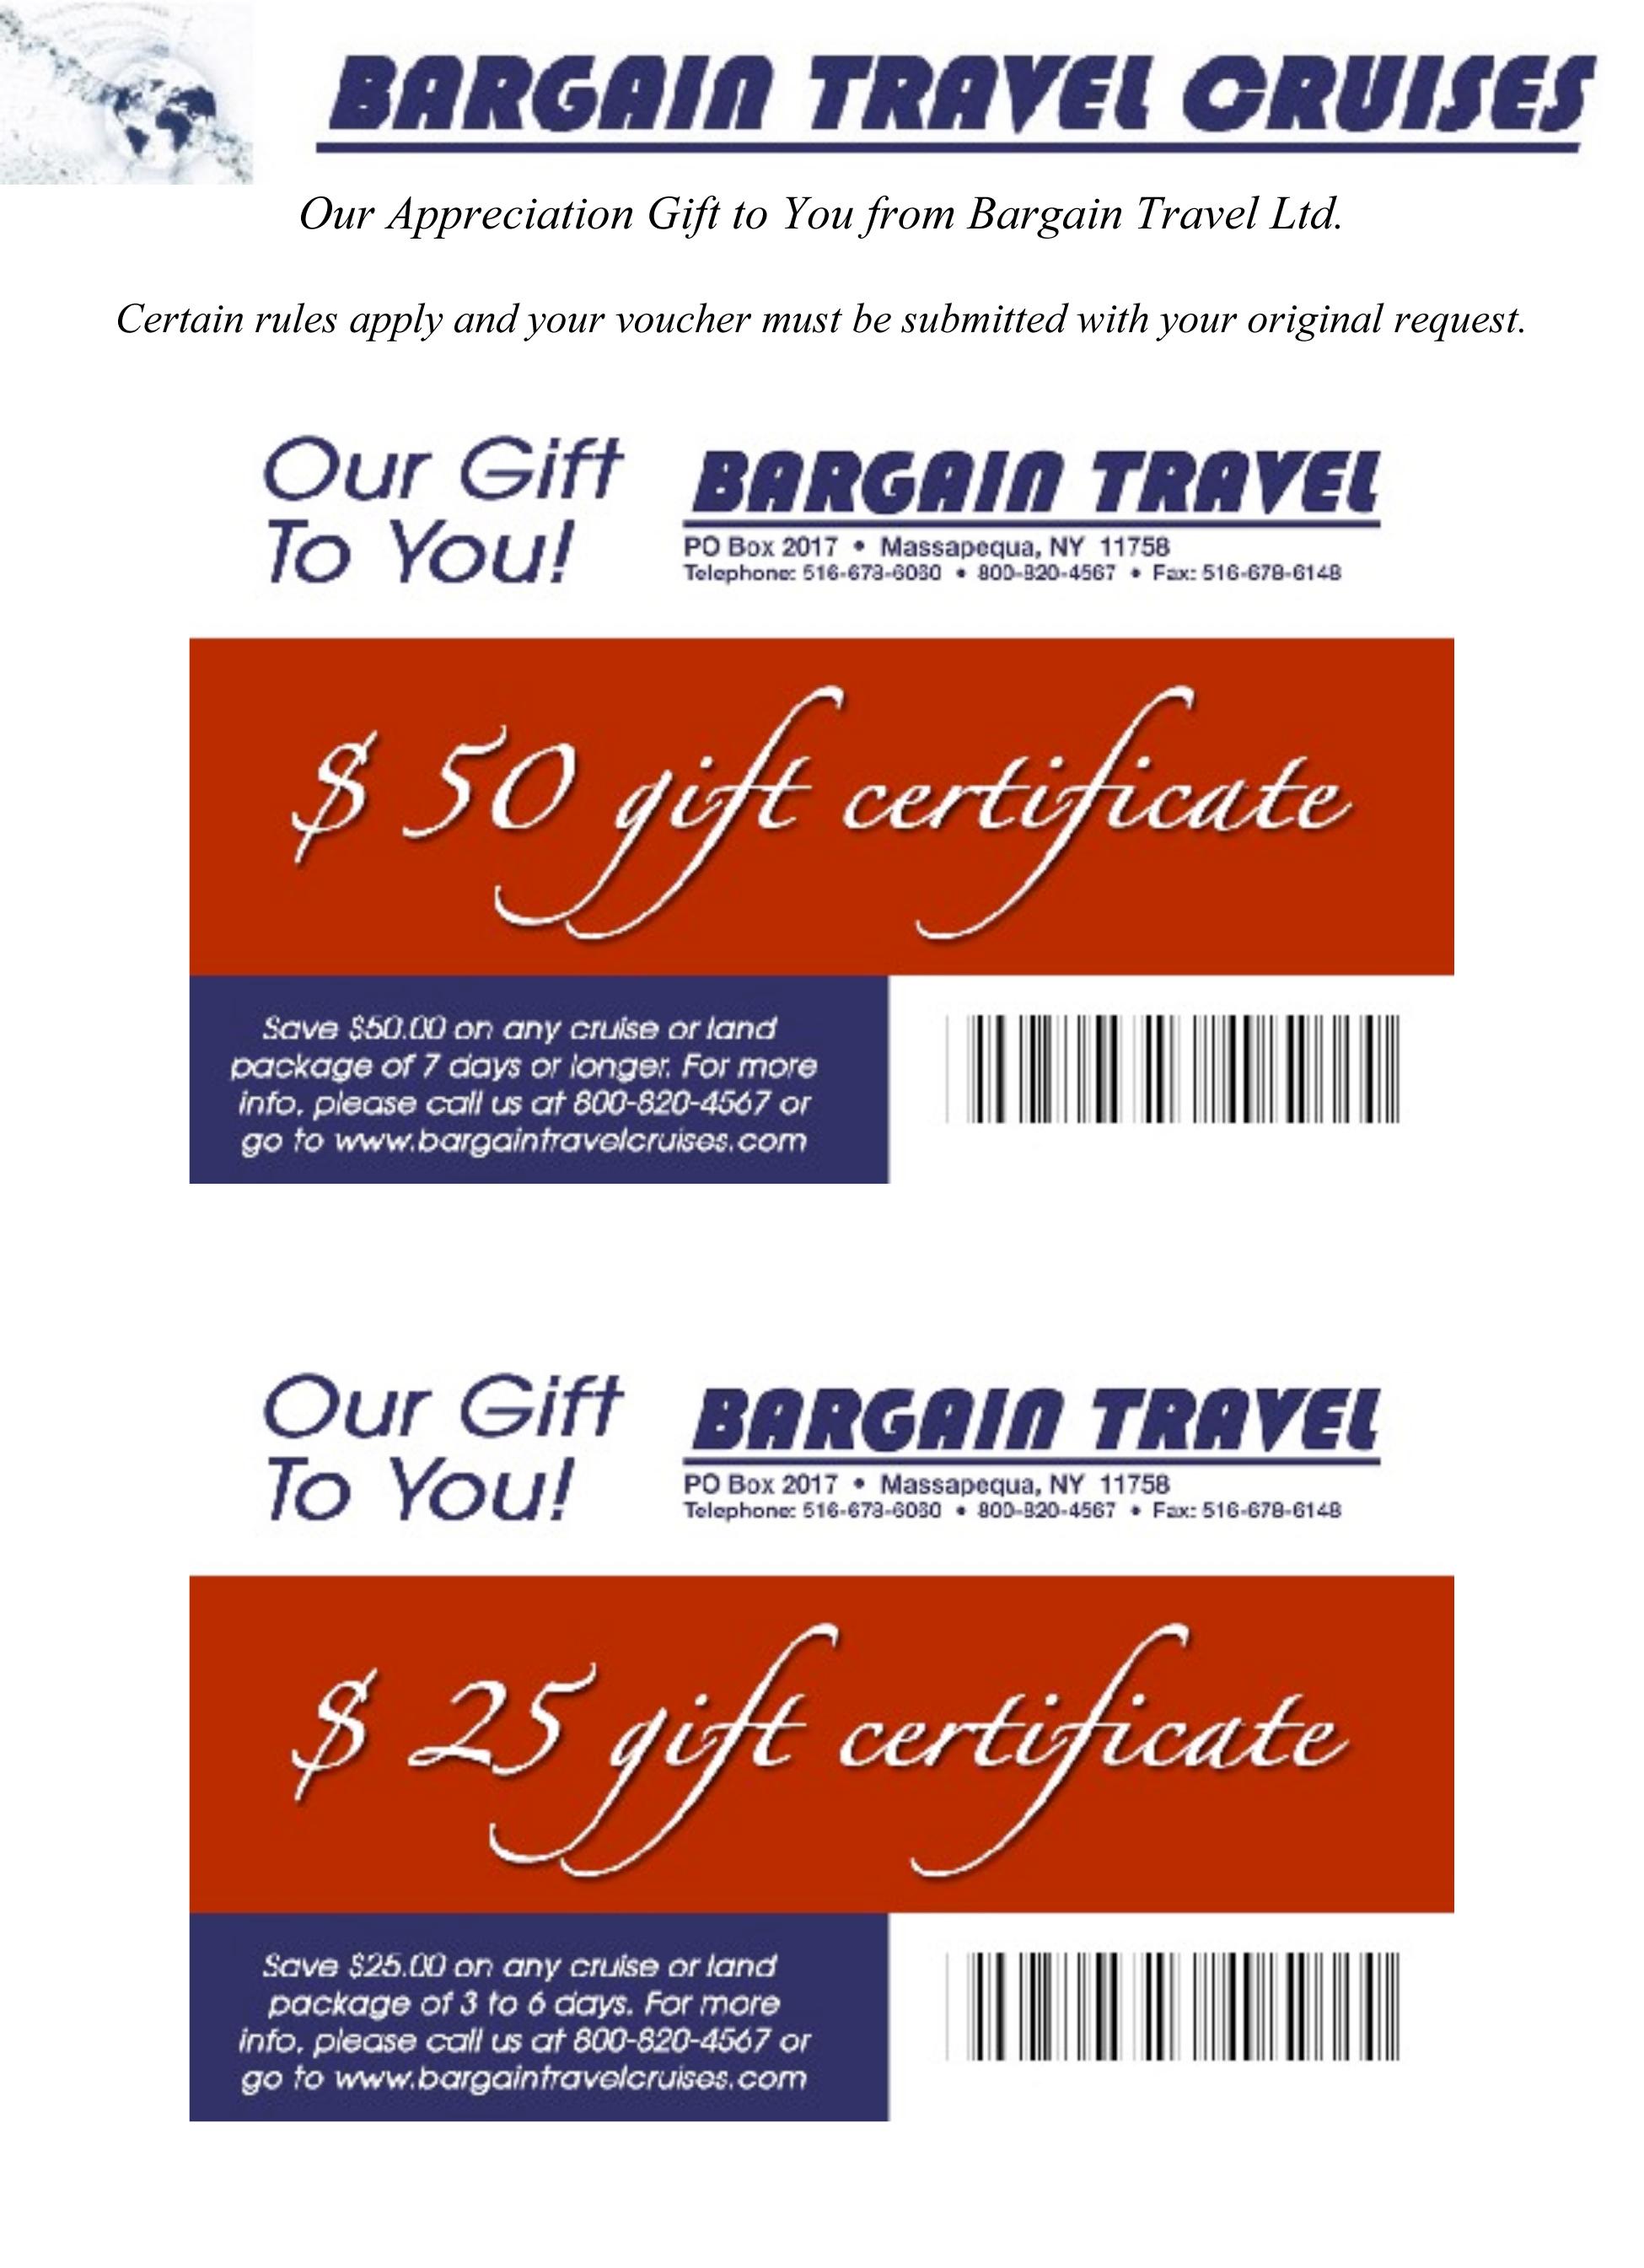 BT Gift Certificates [Dec 2012]